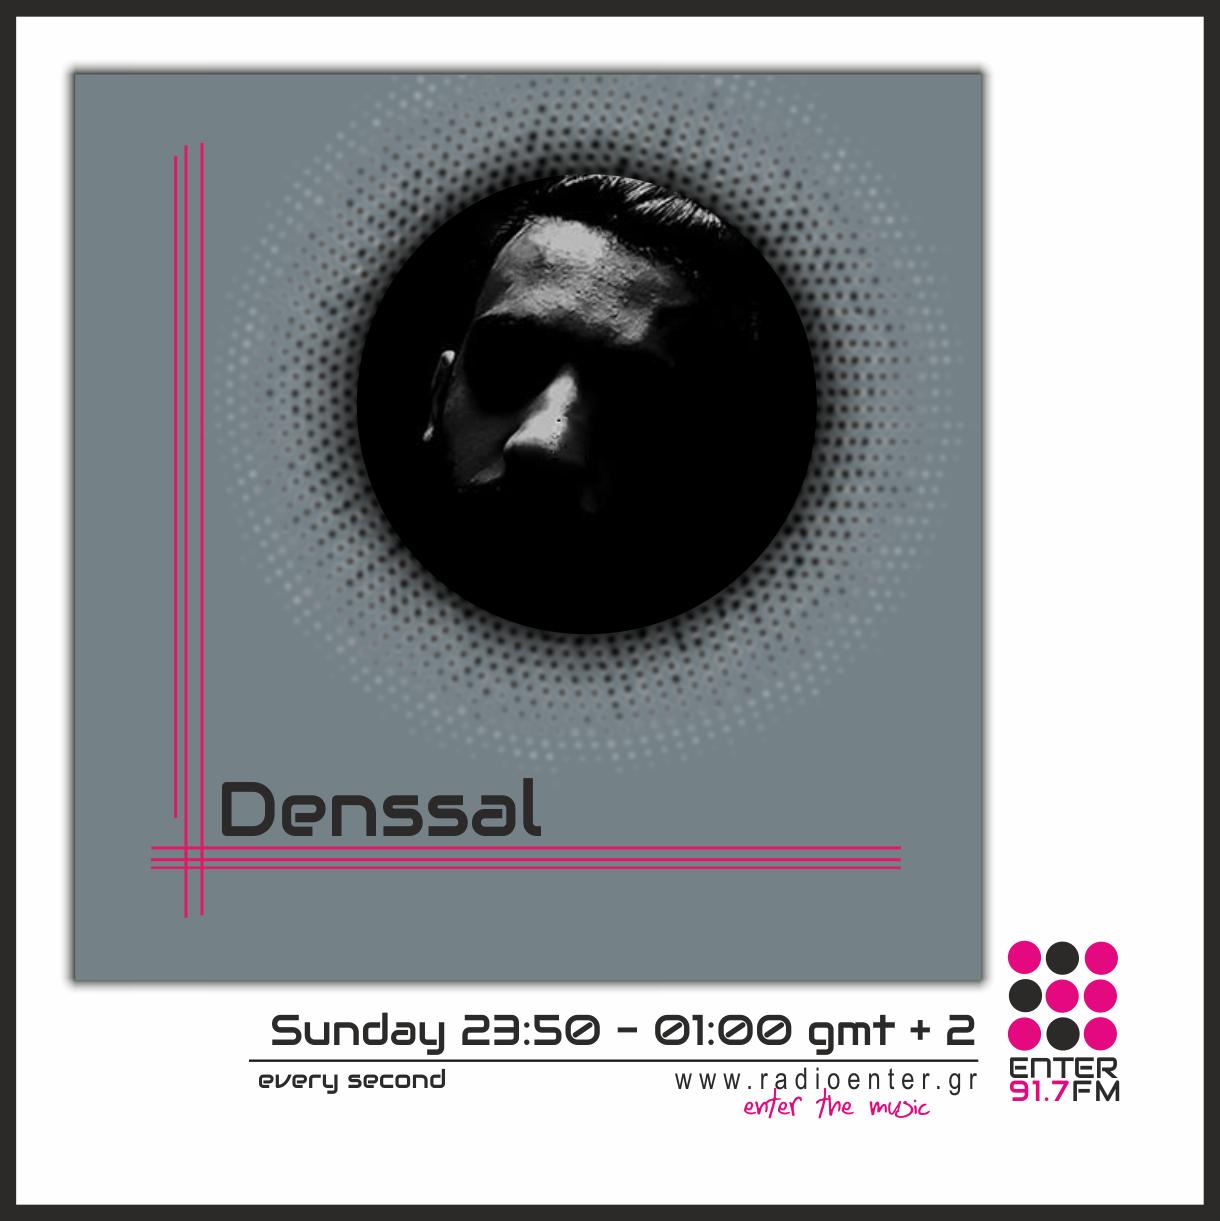 Denssal _ Radio Enter 2018